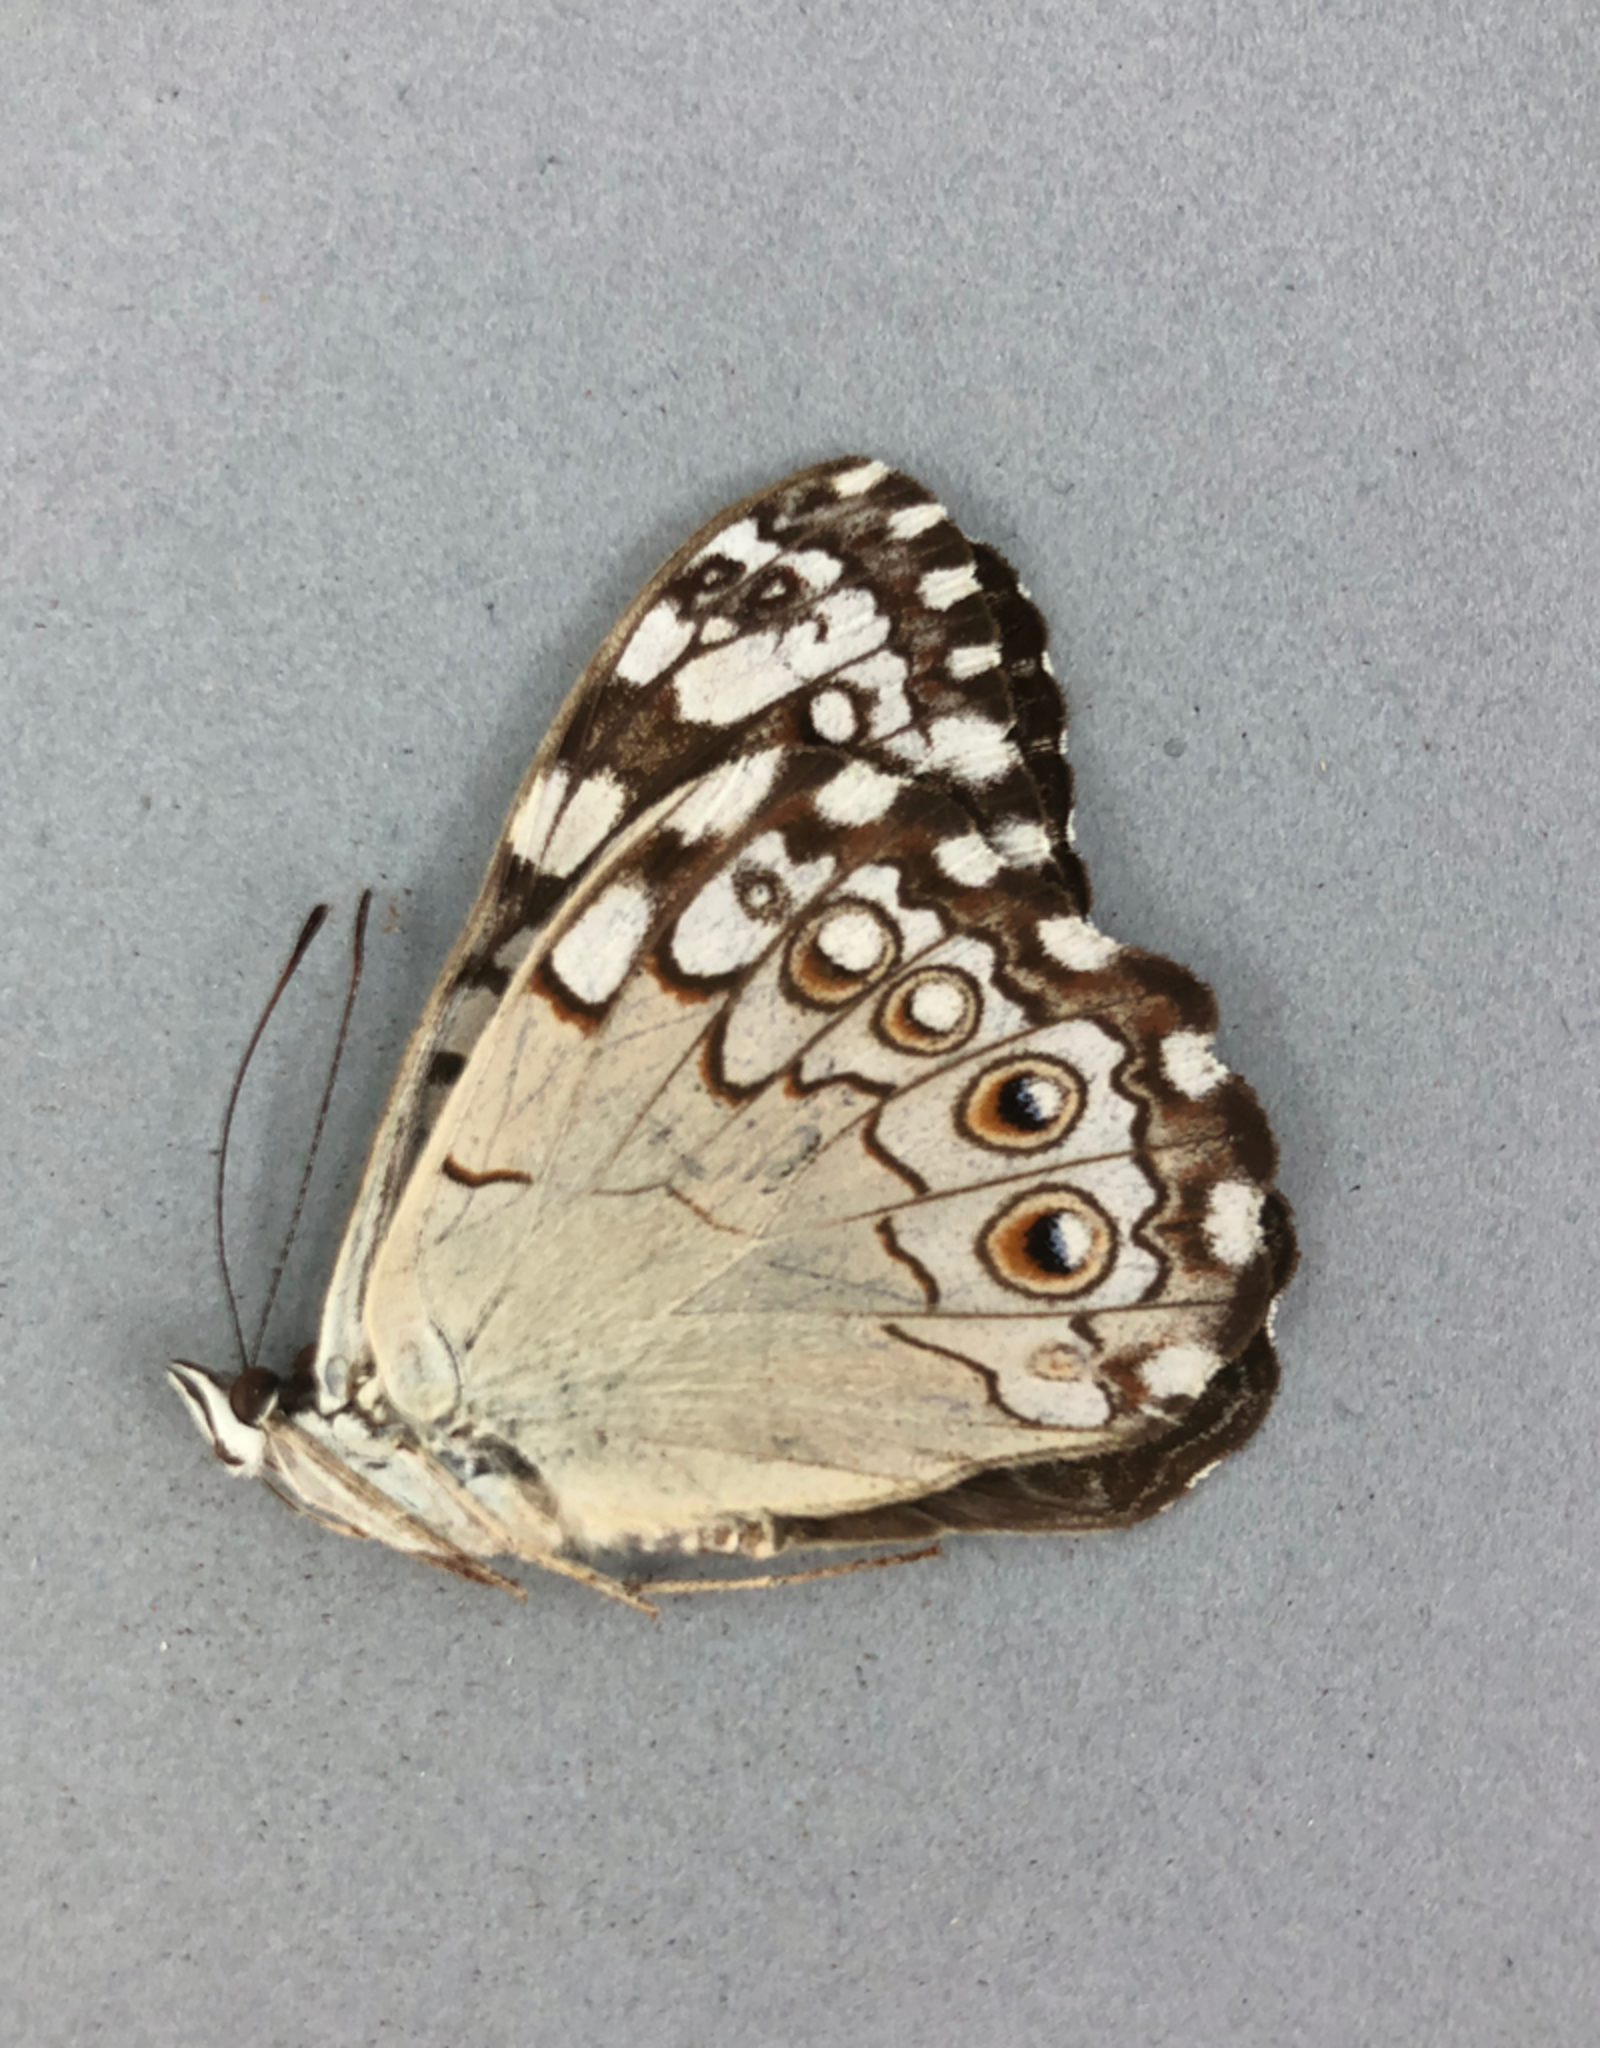 Hamadryas feronia M A1 Ecuador